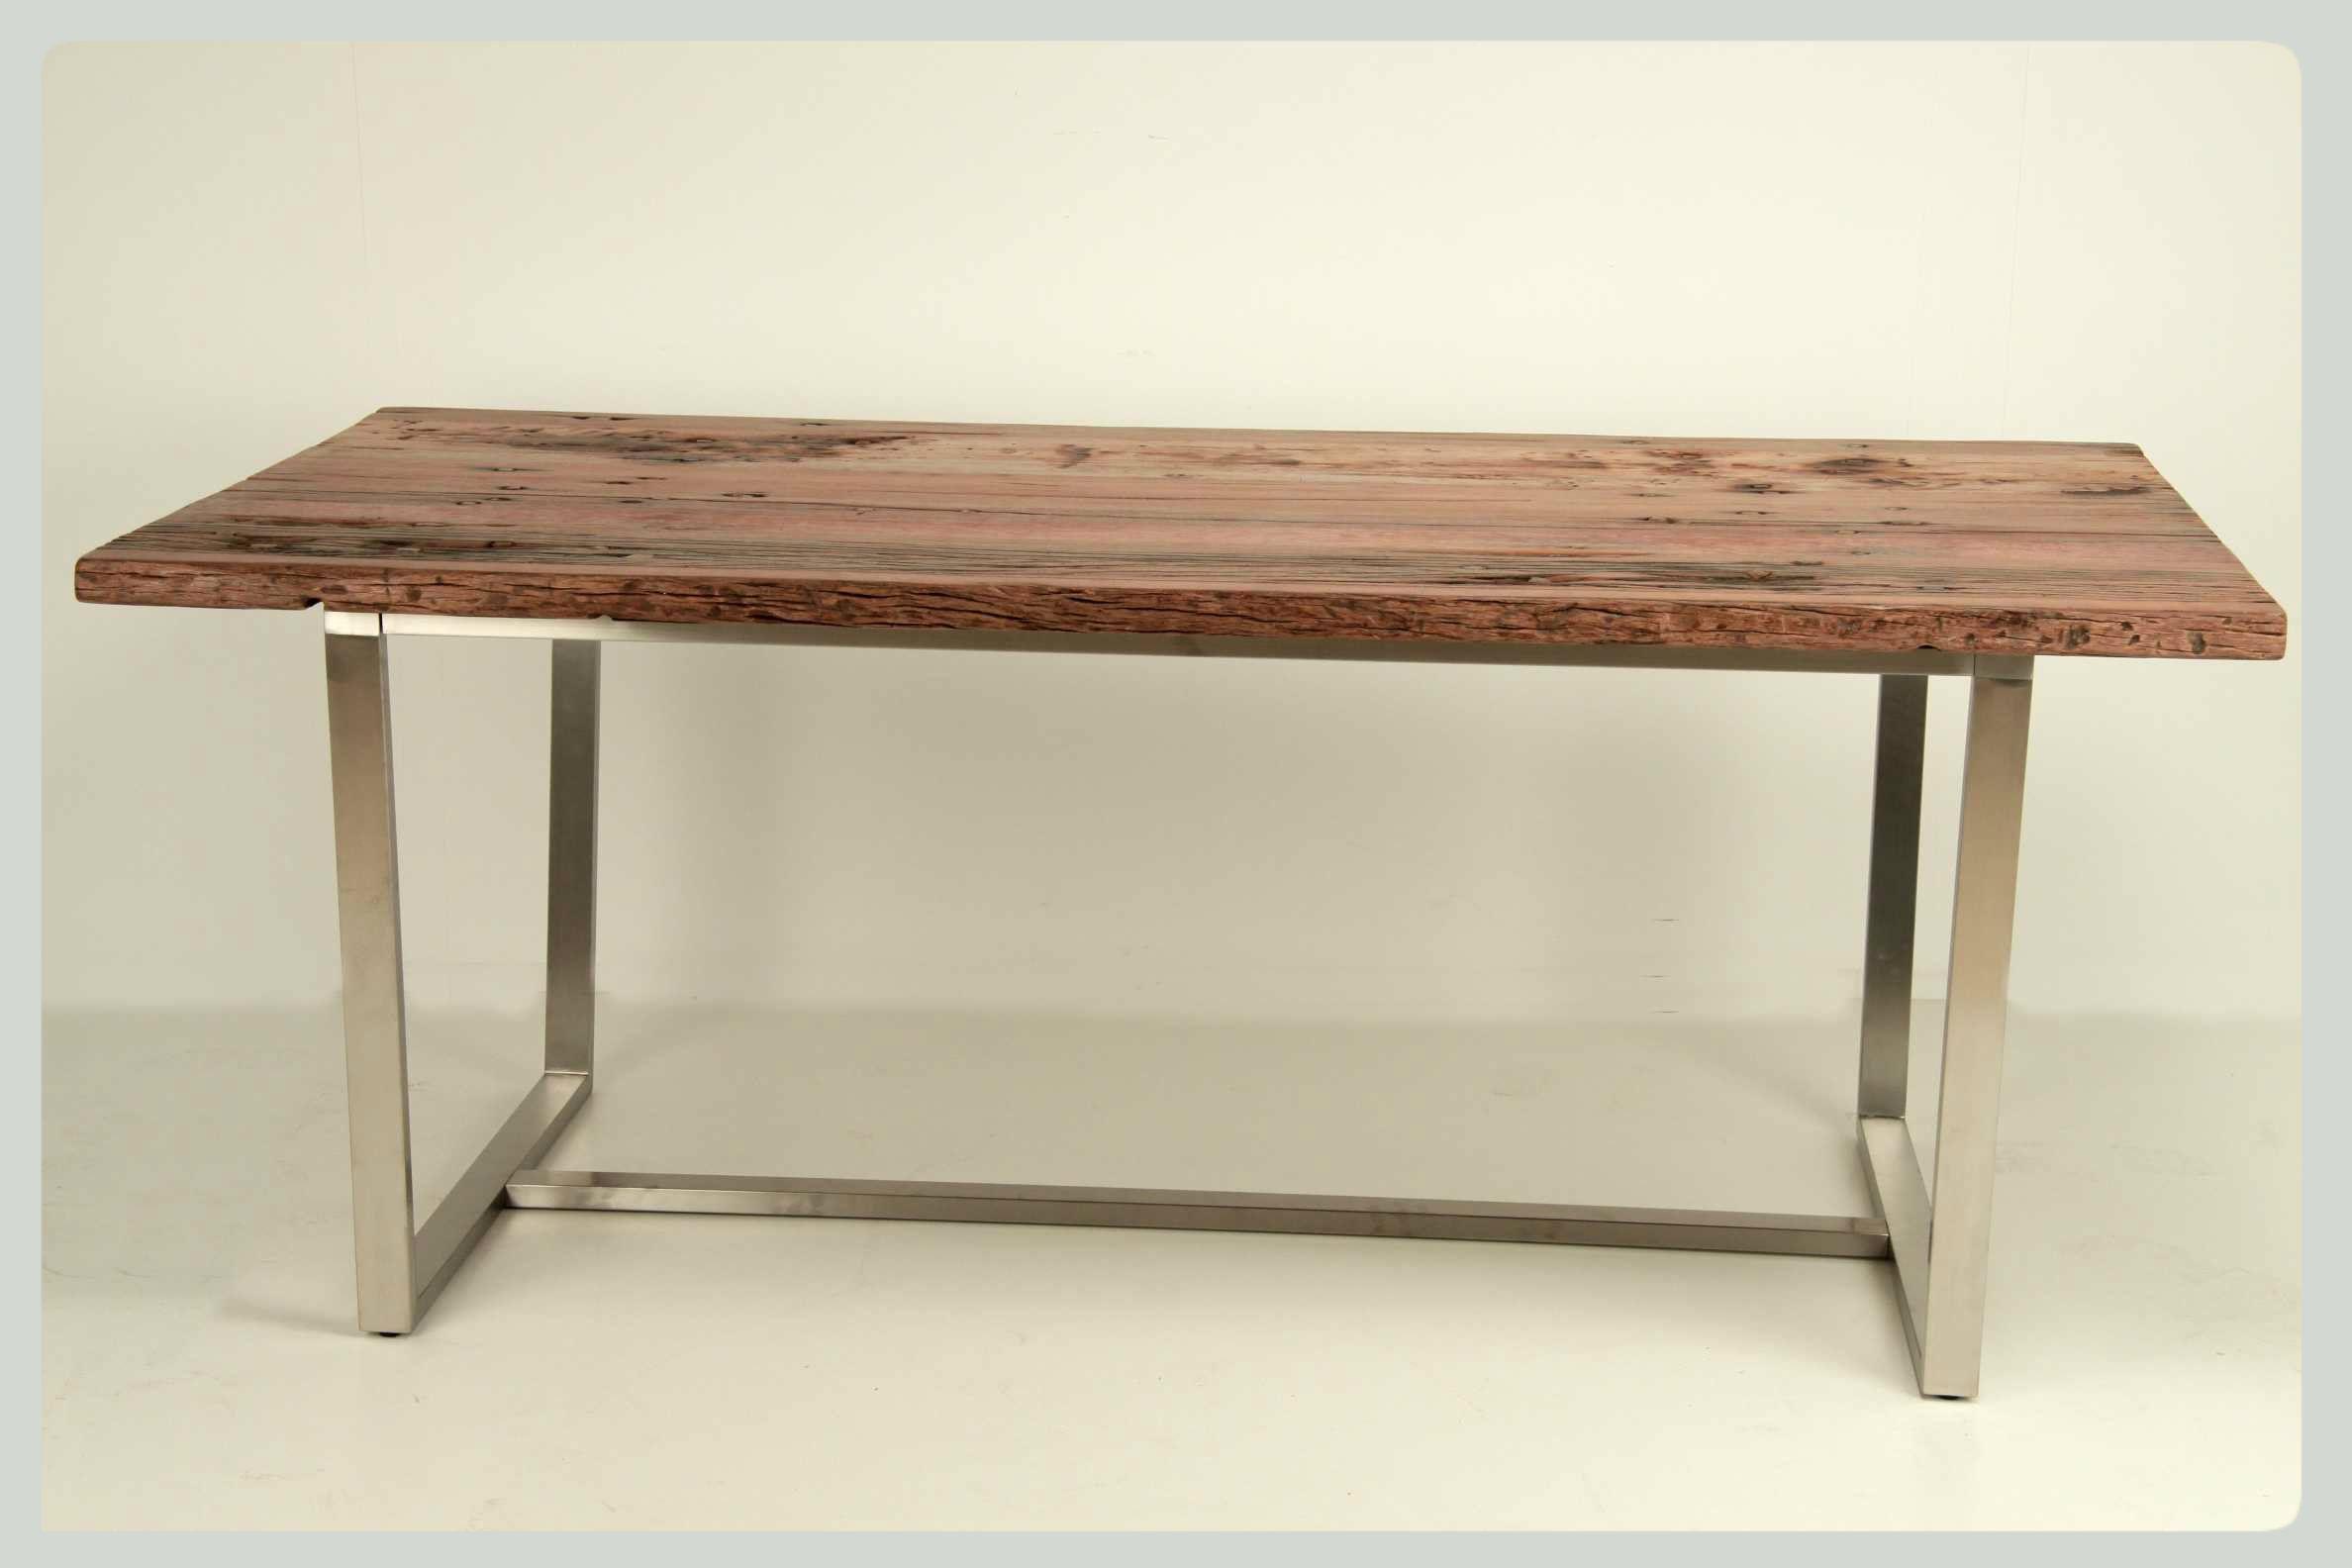 Mesa tapa madera 2 376 1 584 pixels posibles - Mesas antiguas de cocina ...